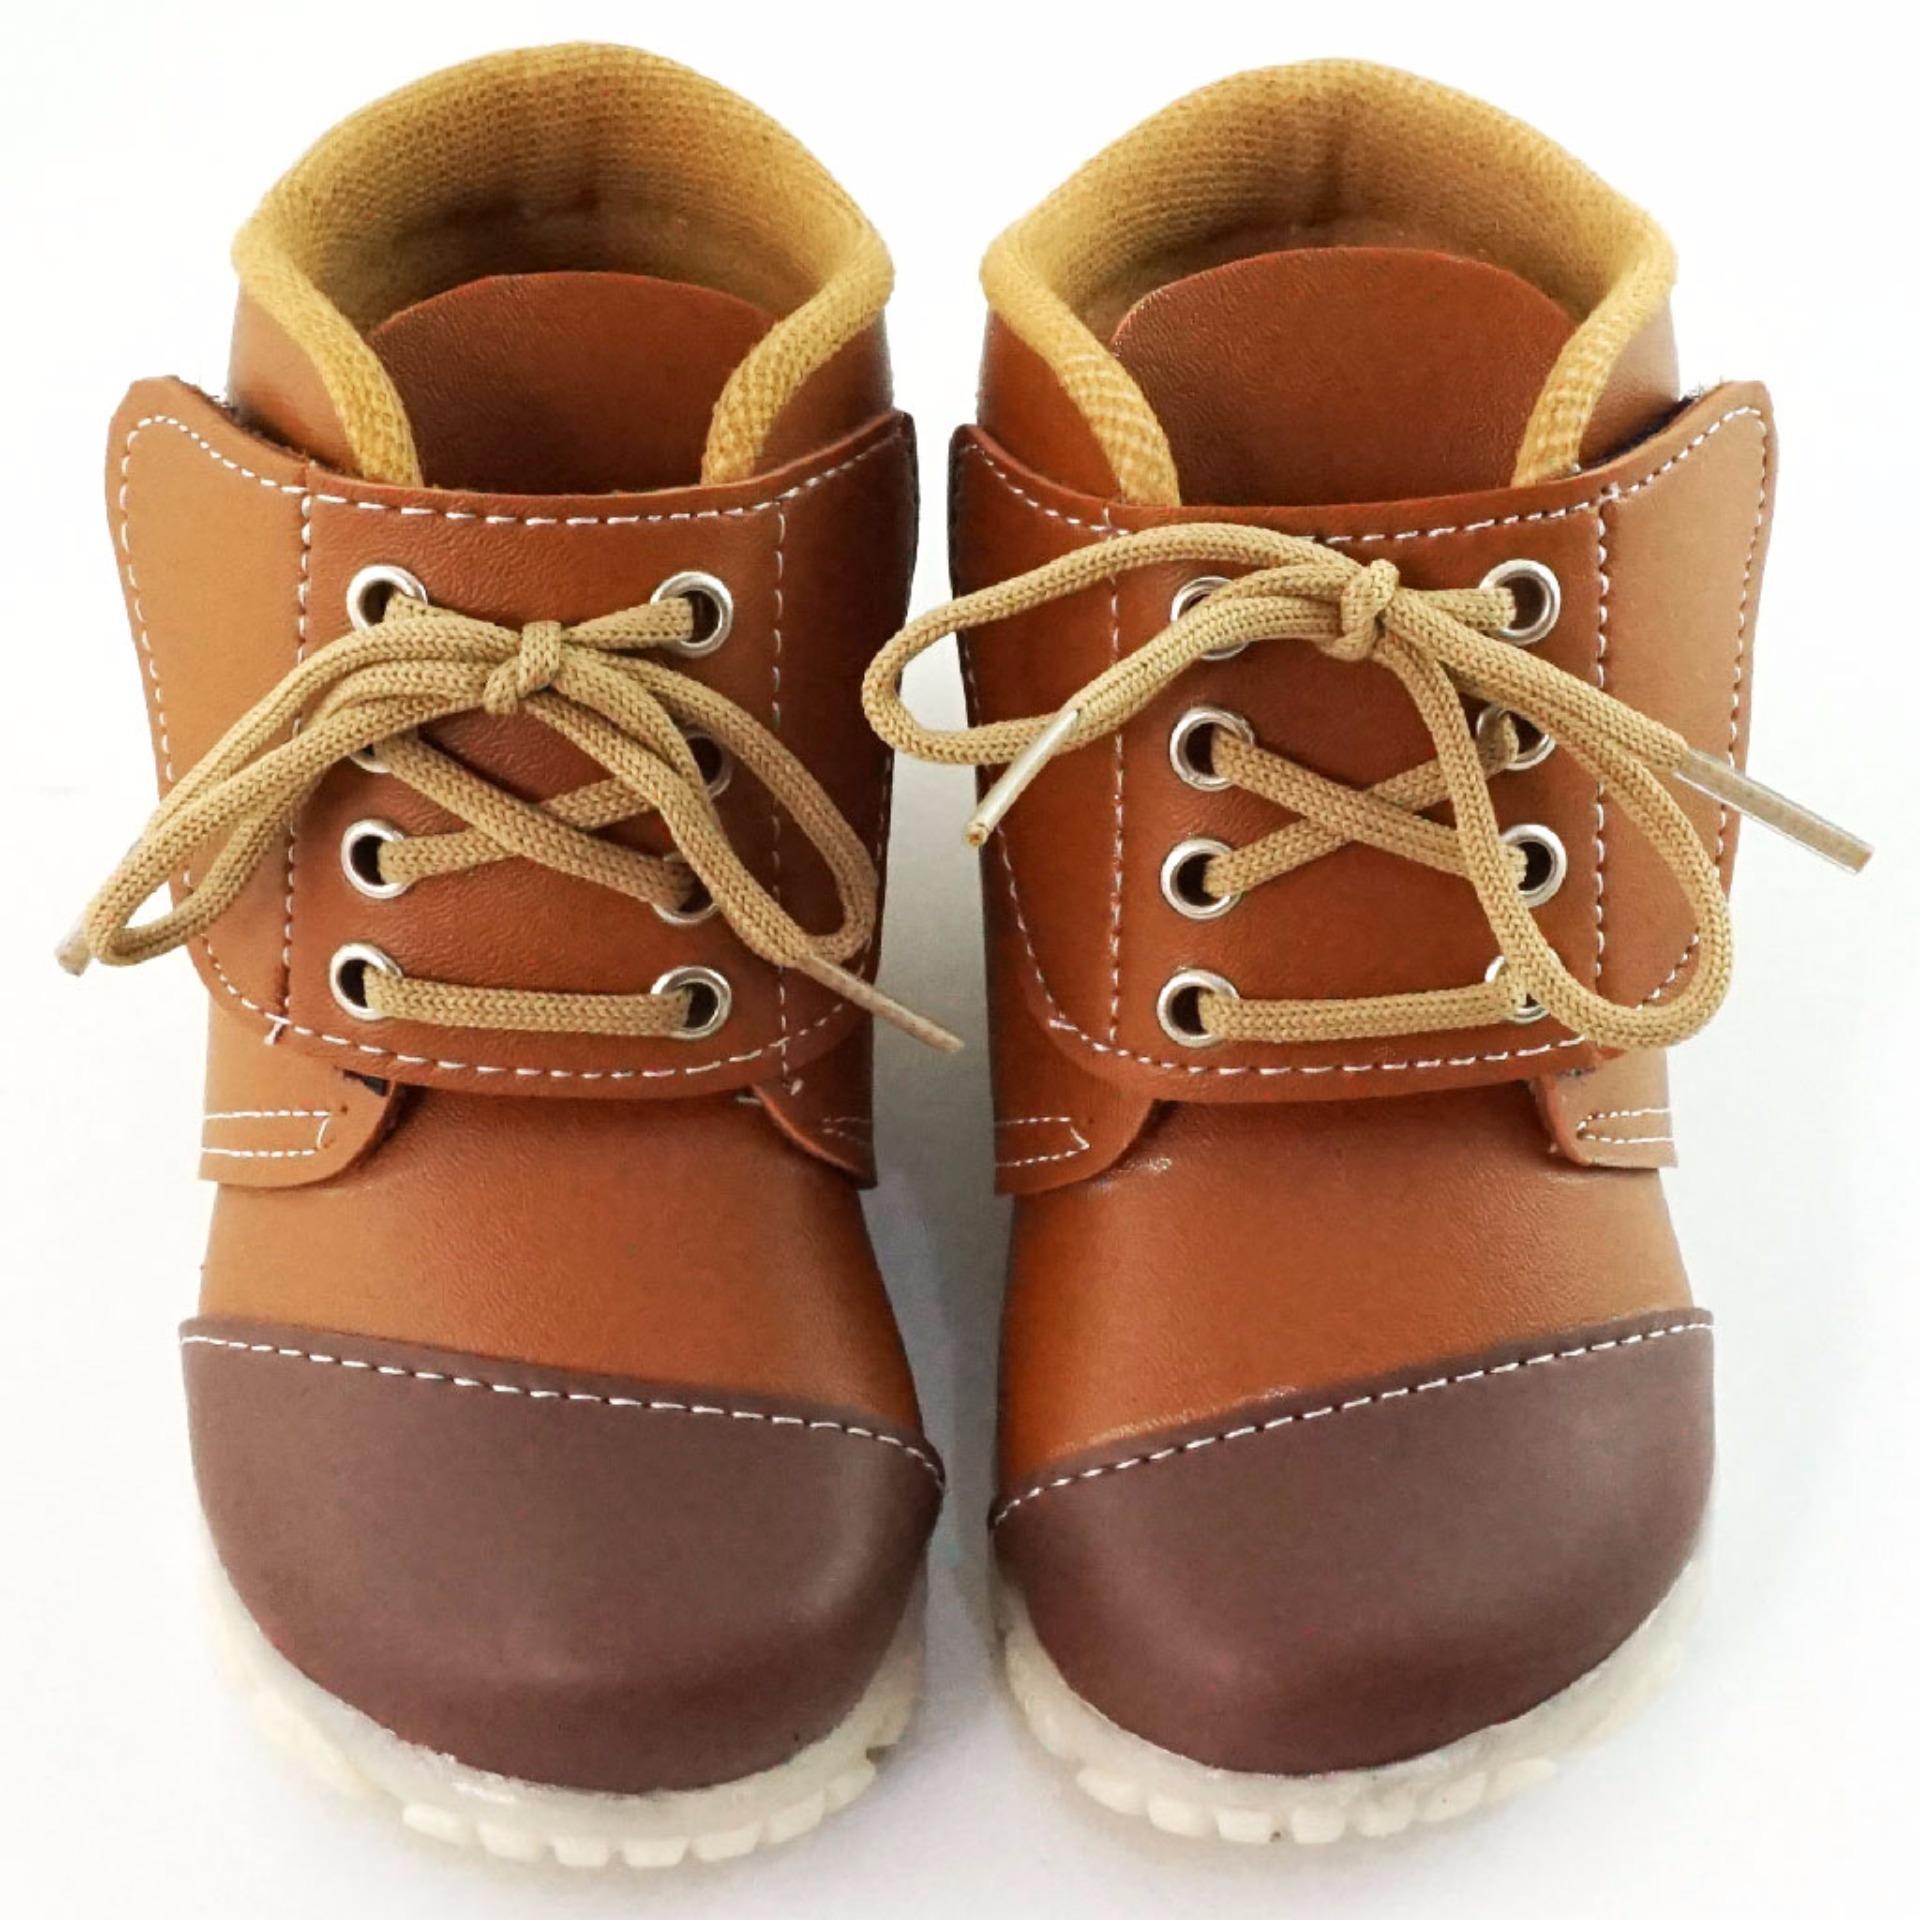 Trendishoes Sepatu Boot Anak Bayi Laki Laki Okeboy Ddokb Tan ... e47ed80ec5